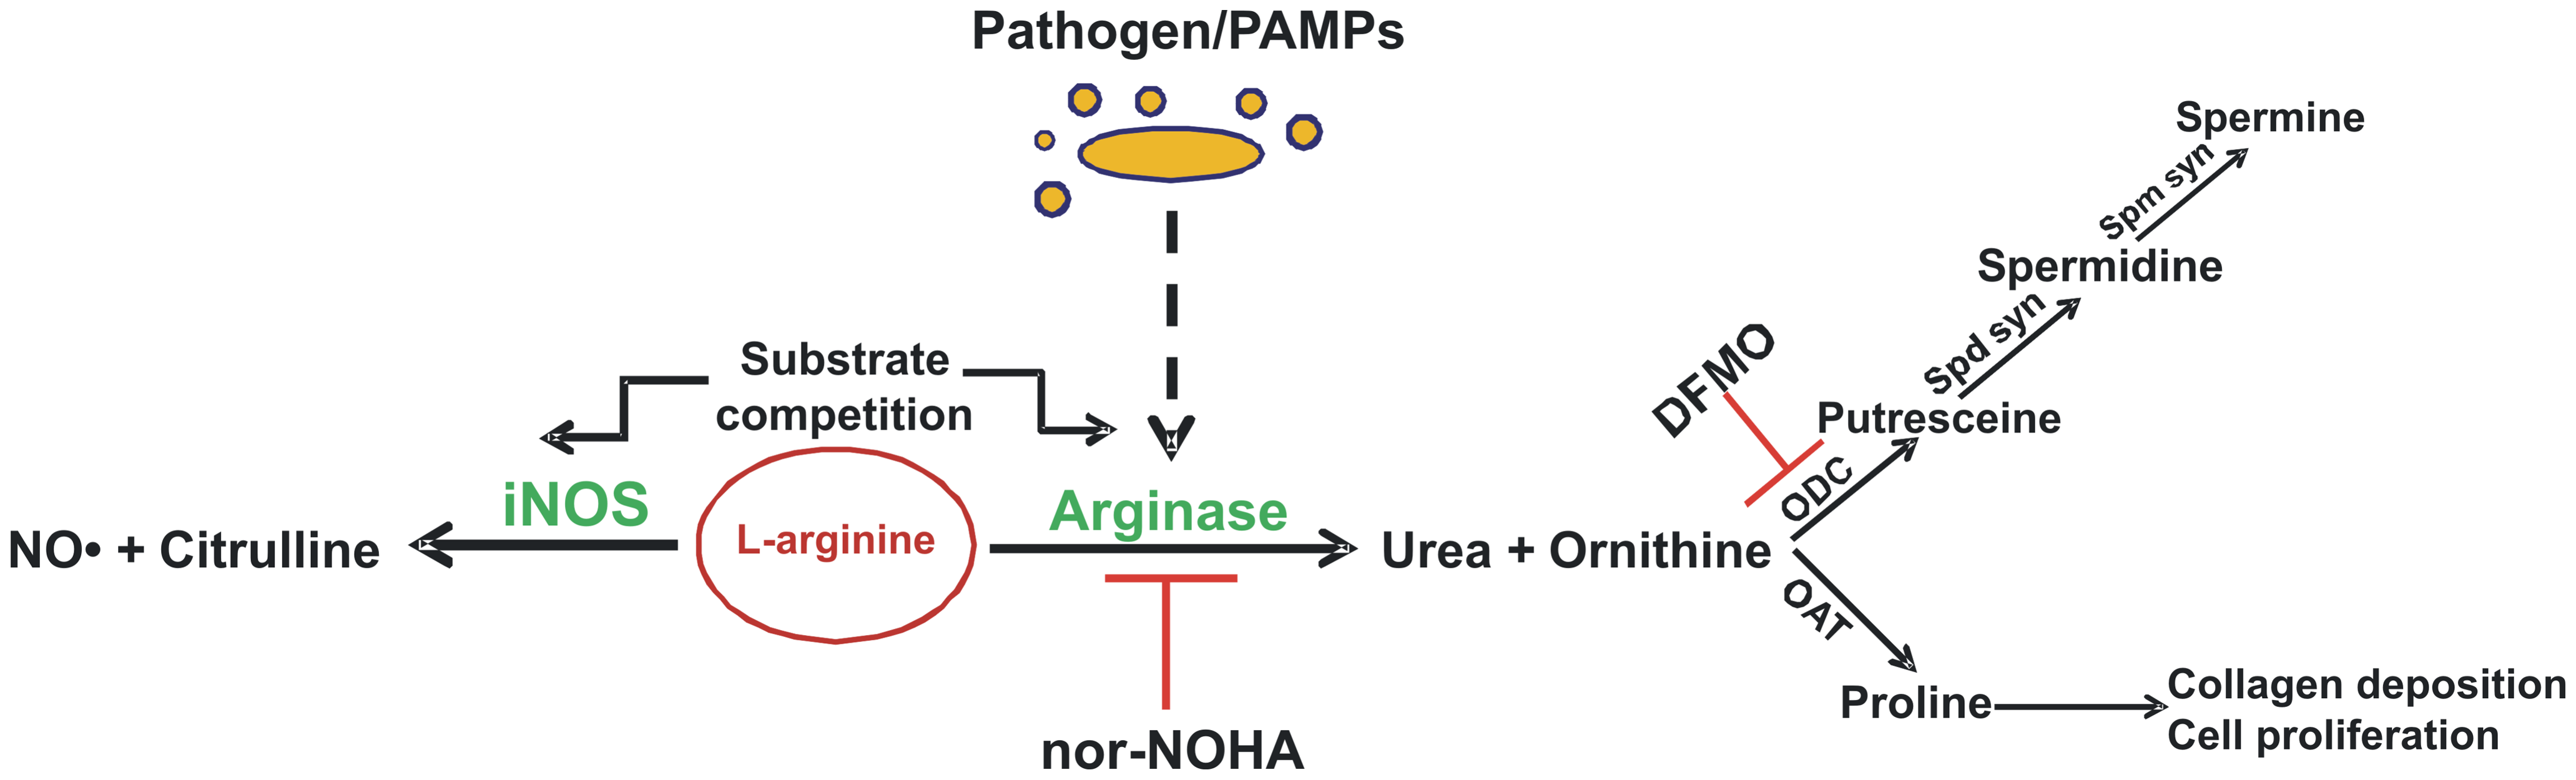 Overview of mammalian arginine metabolism.